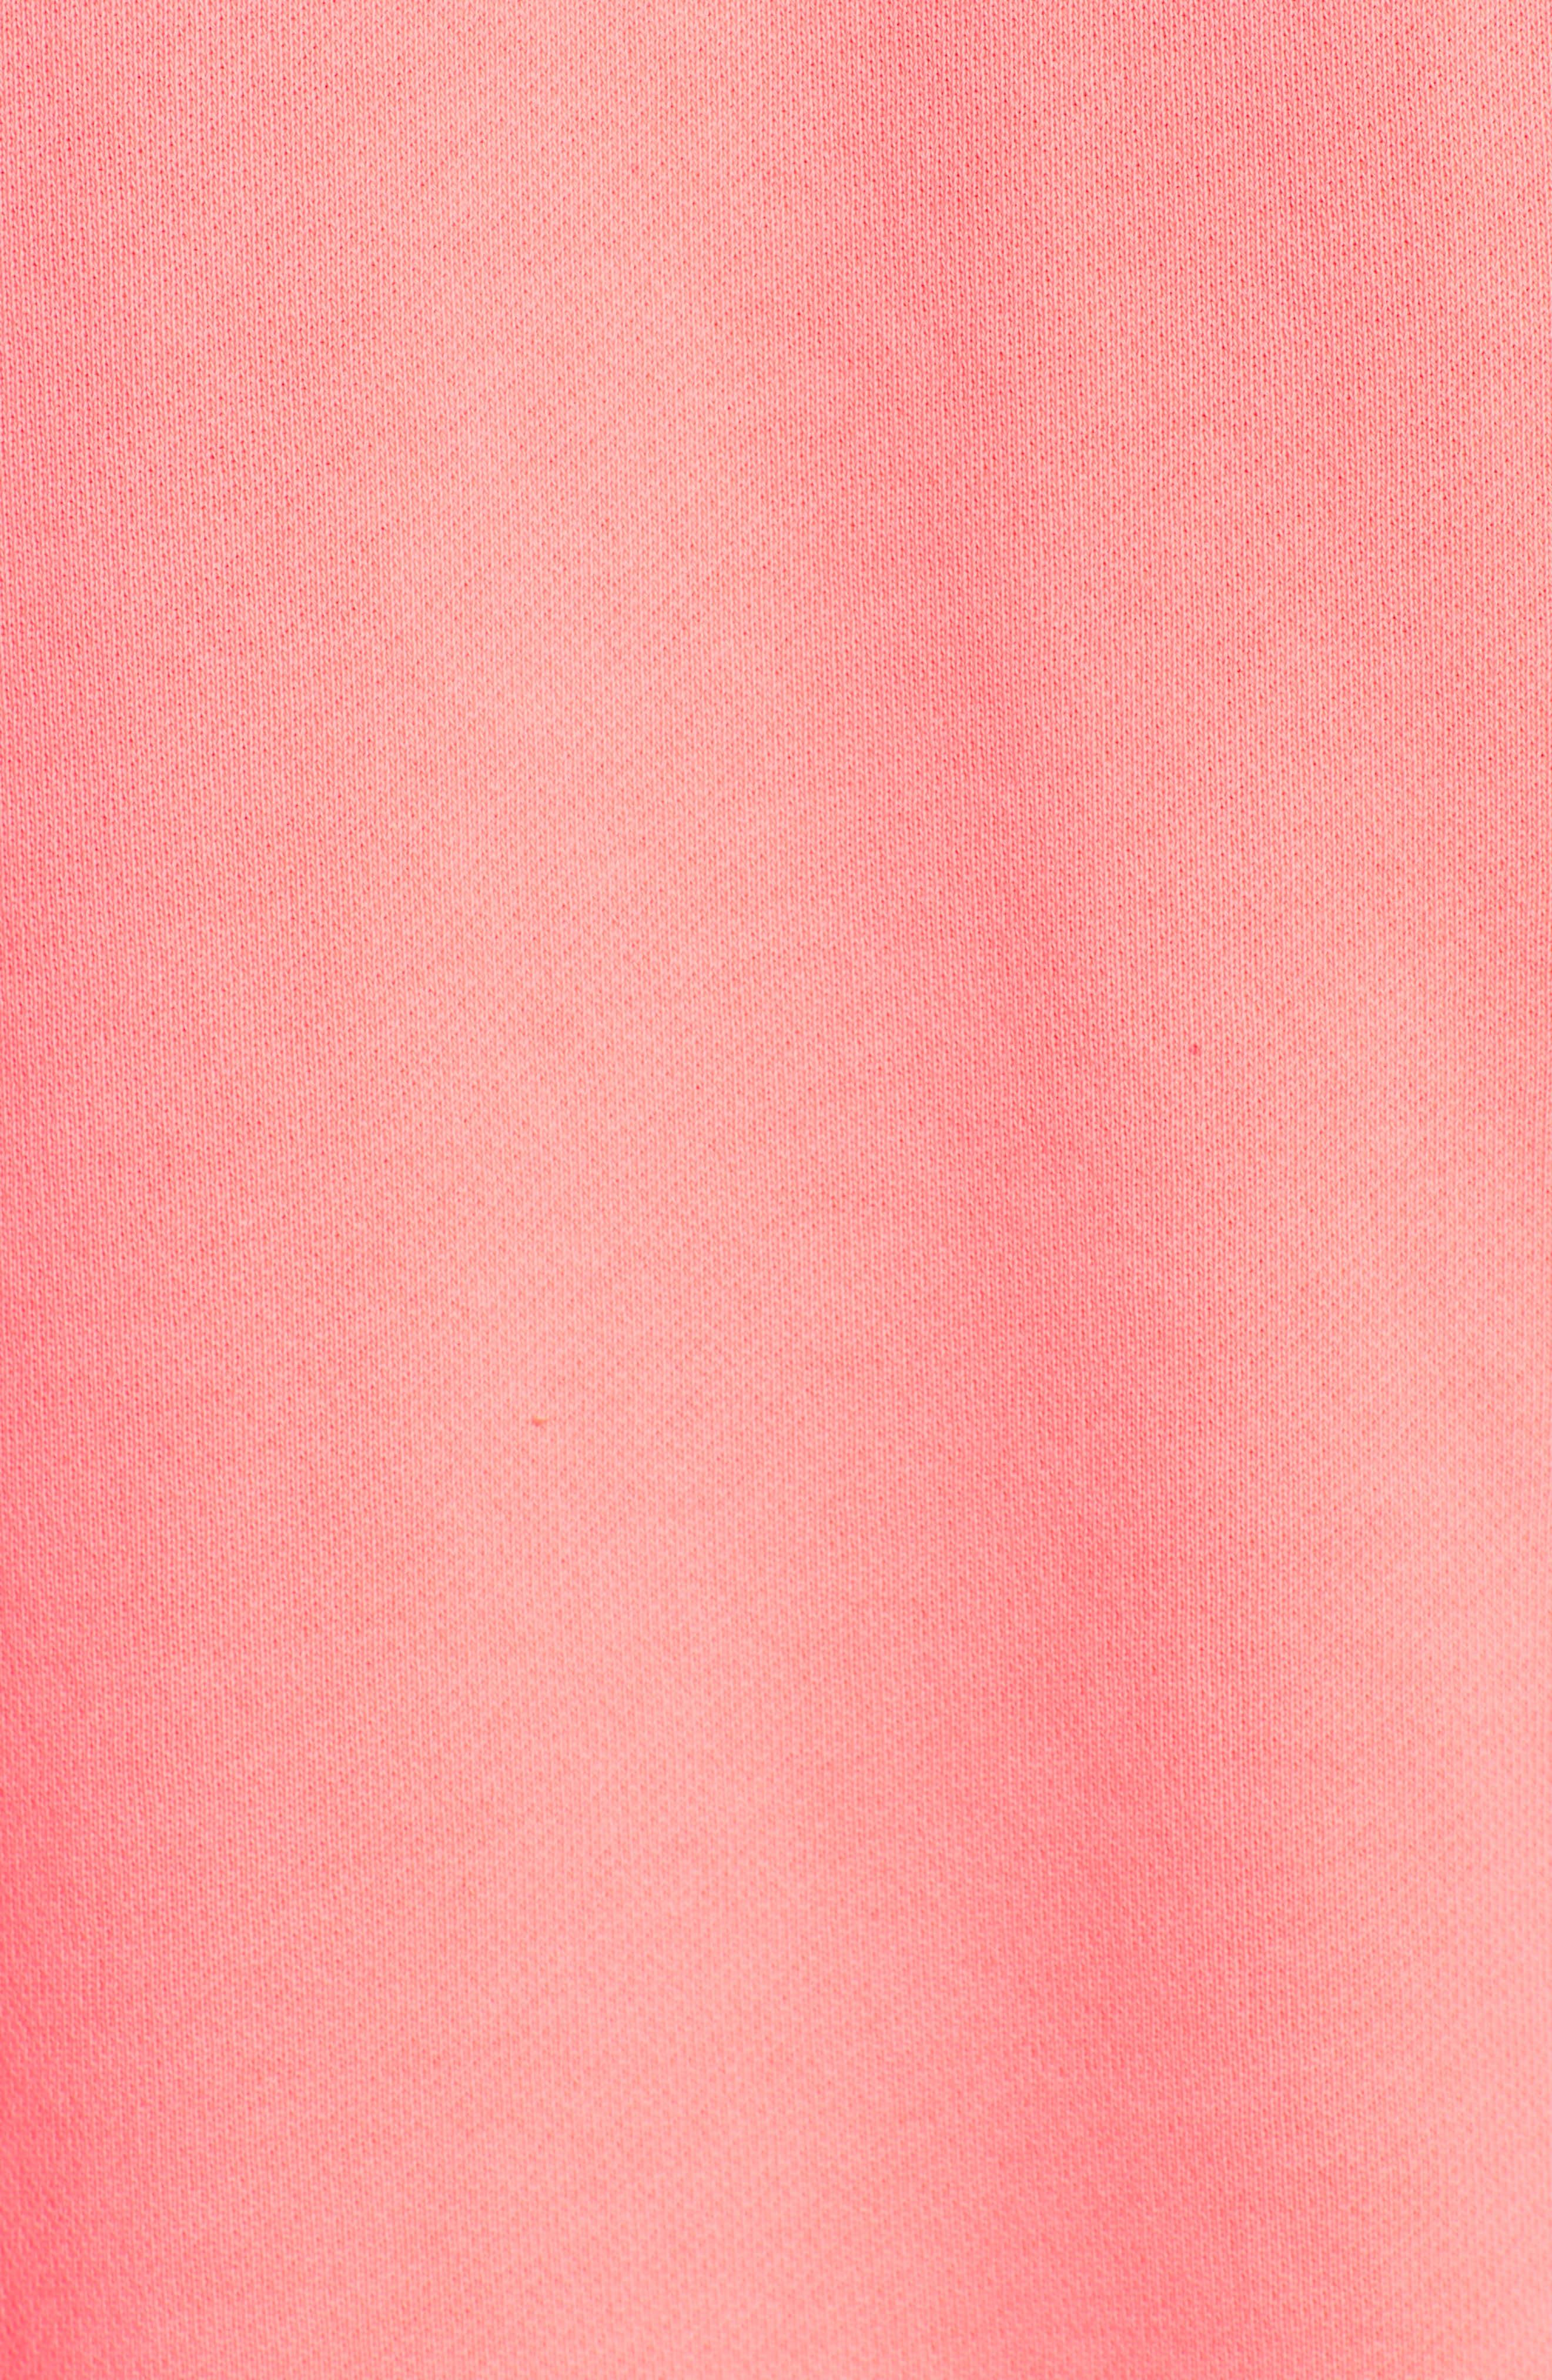 VINEYARD VINES,                             Garment Dyed Classic Shep Pullover,                             Alternate thumbnail 5, color,                             655